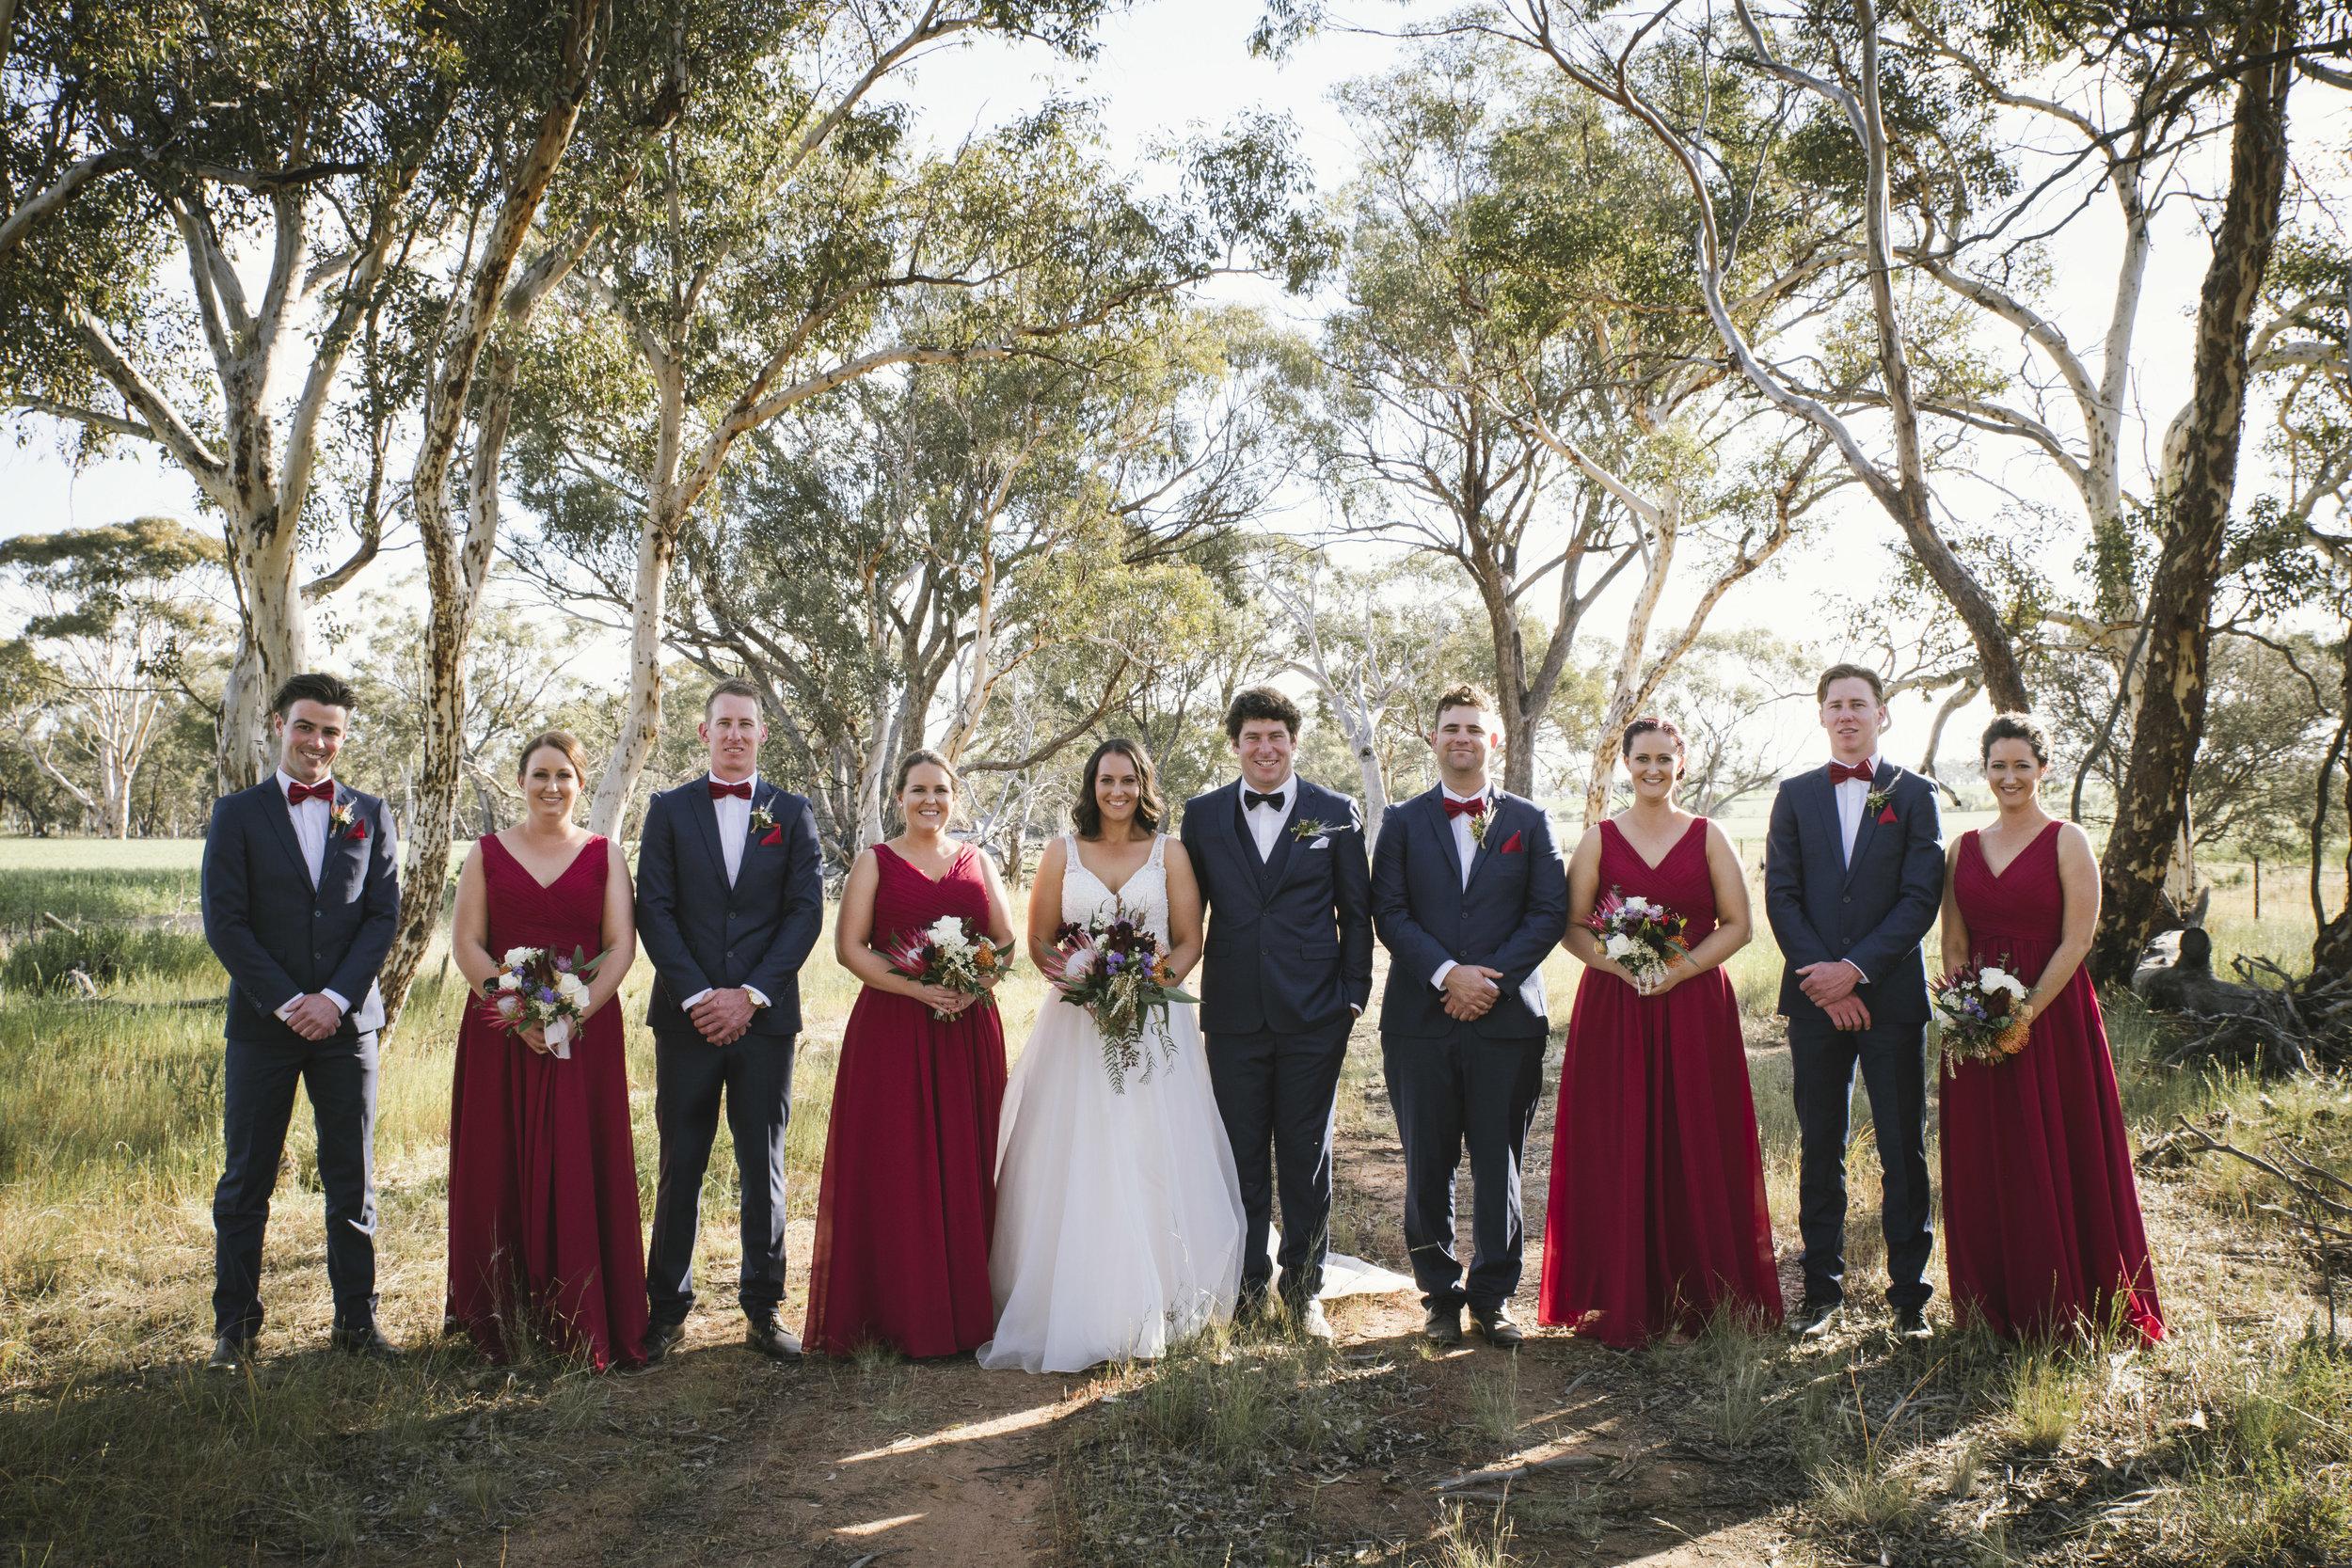 Angie Roe Photography Wheatbelt Avon Valley Farm Wedding (35).jpg